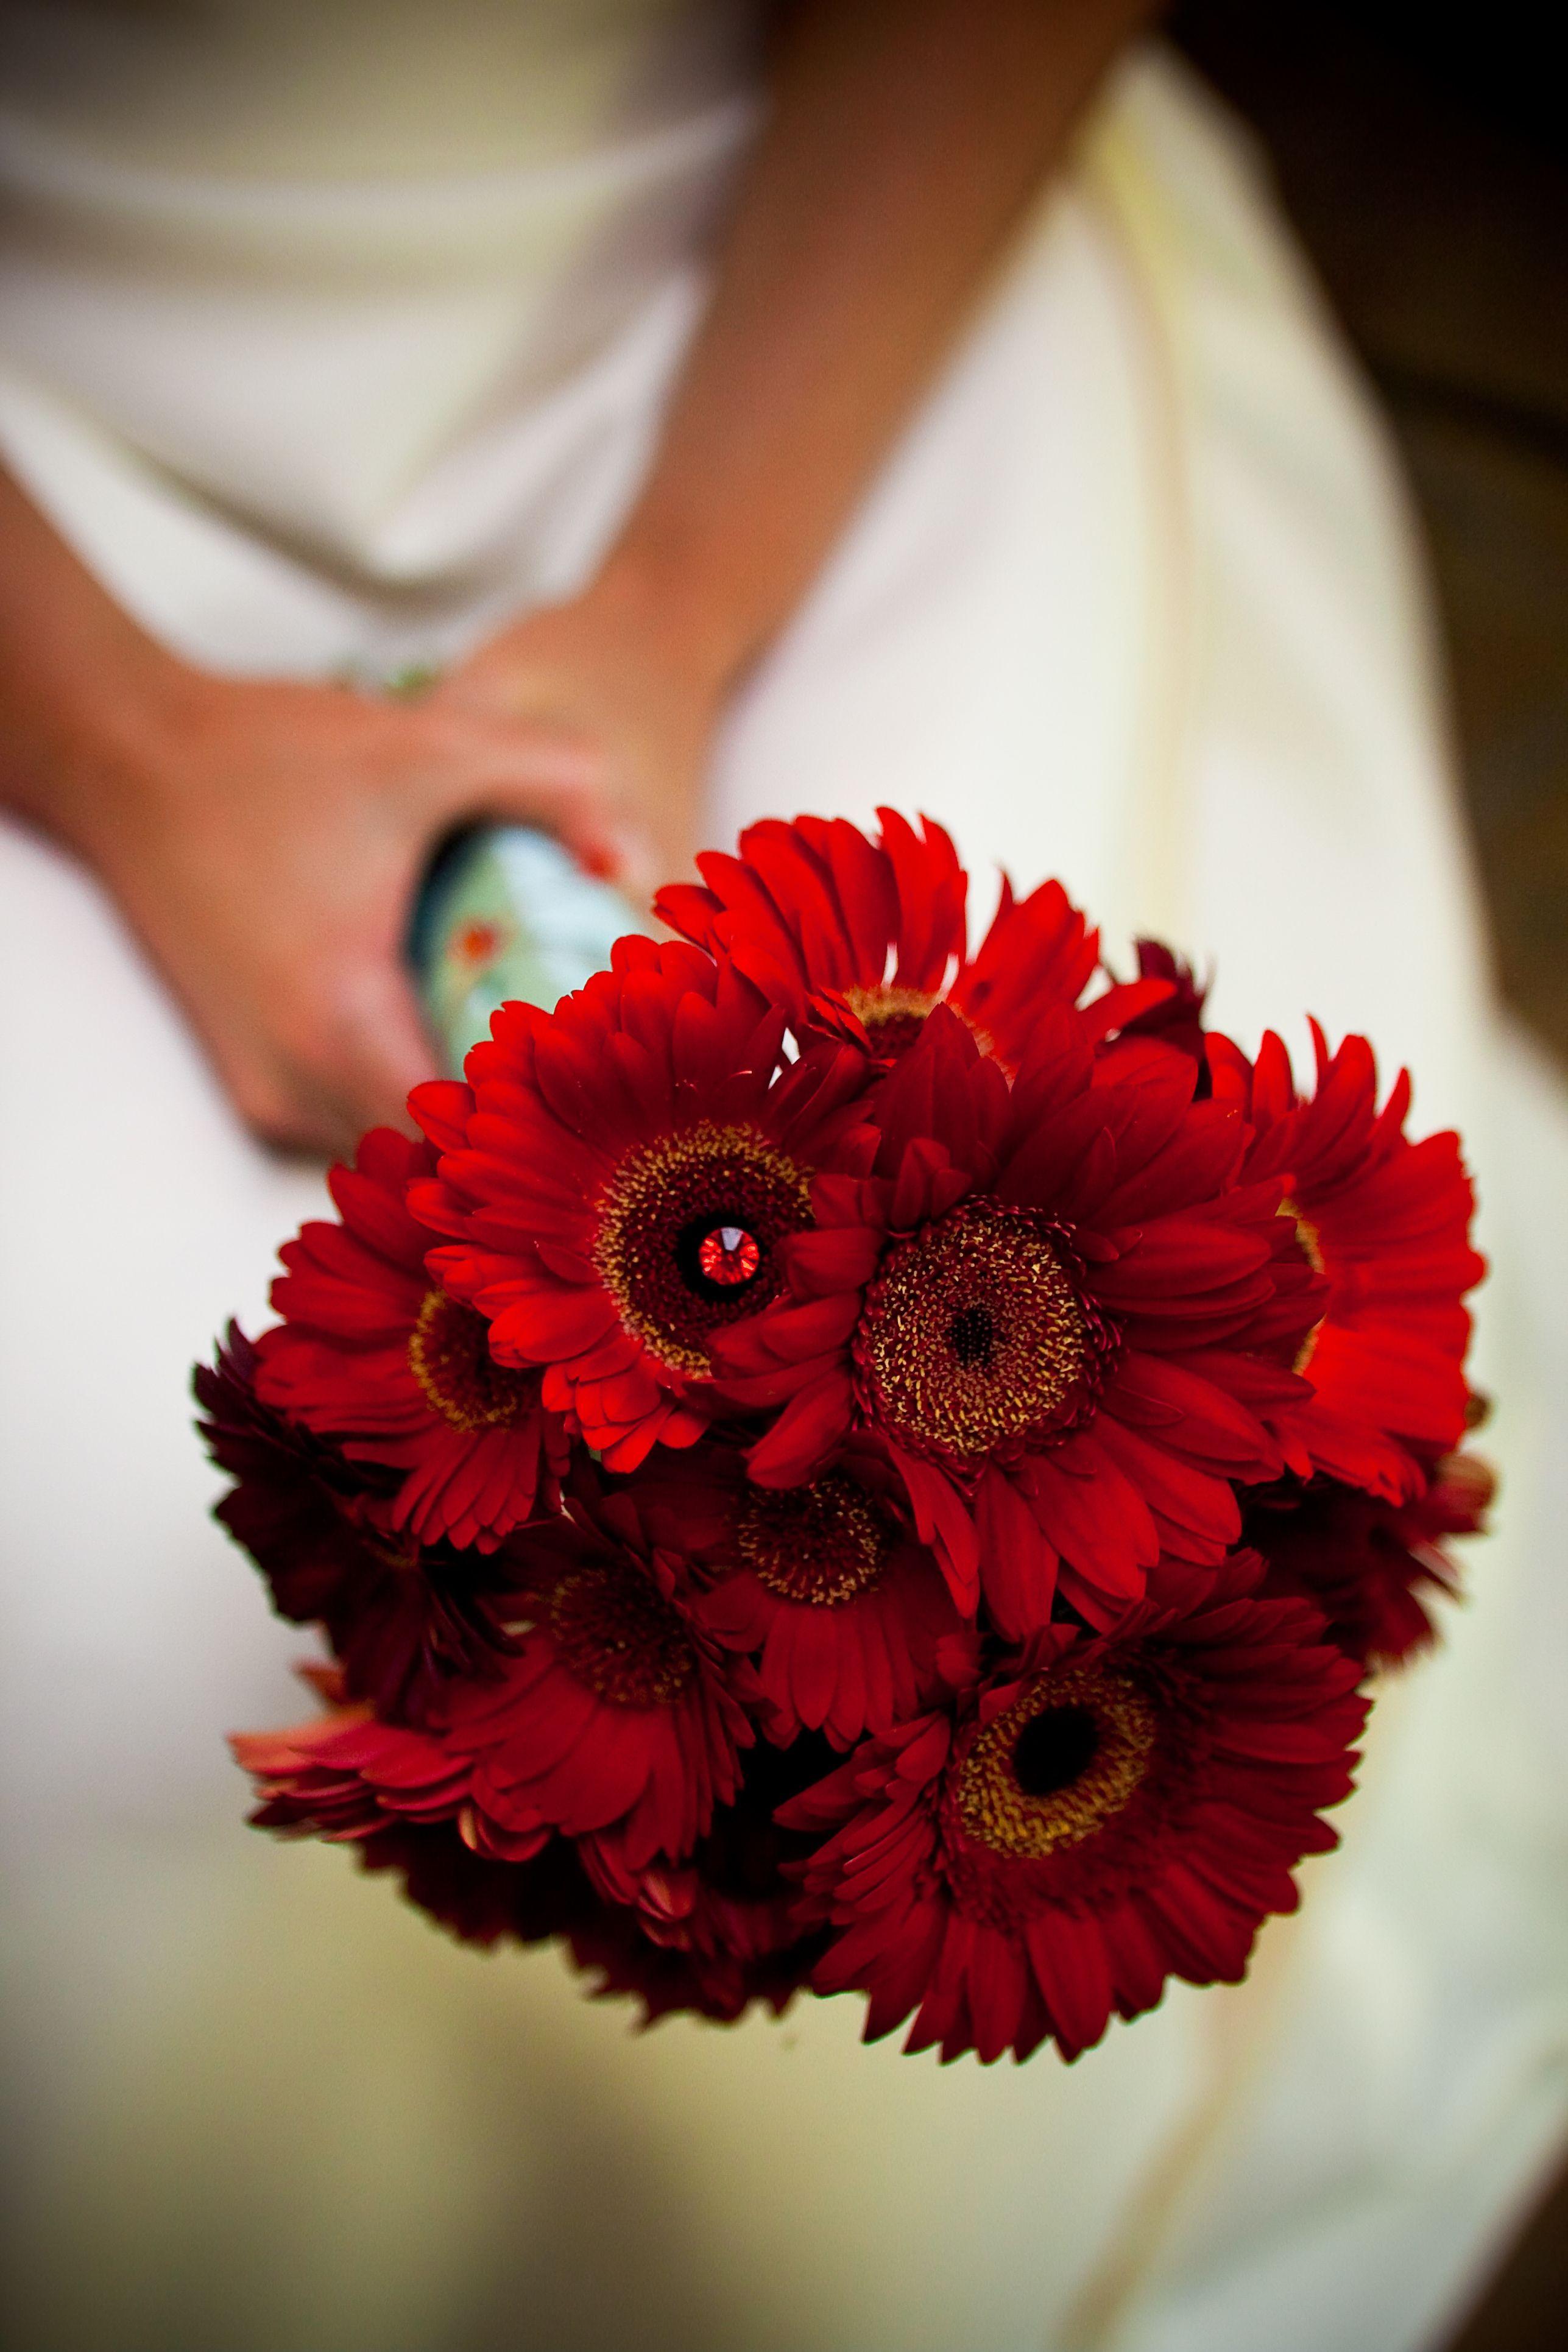 Fiorire Custom Florals By Rosalba Red Bouquet Wedding Gerbera Daisy Daisy Bouquet Wedding